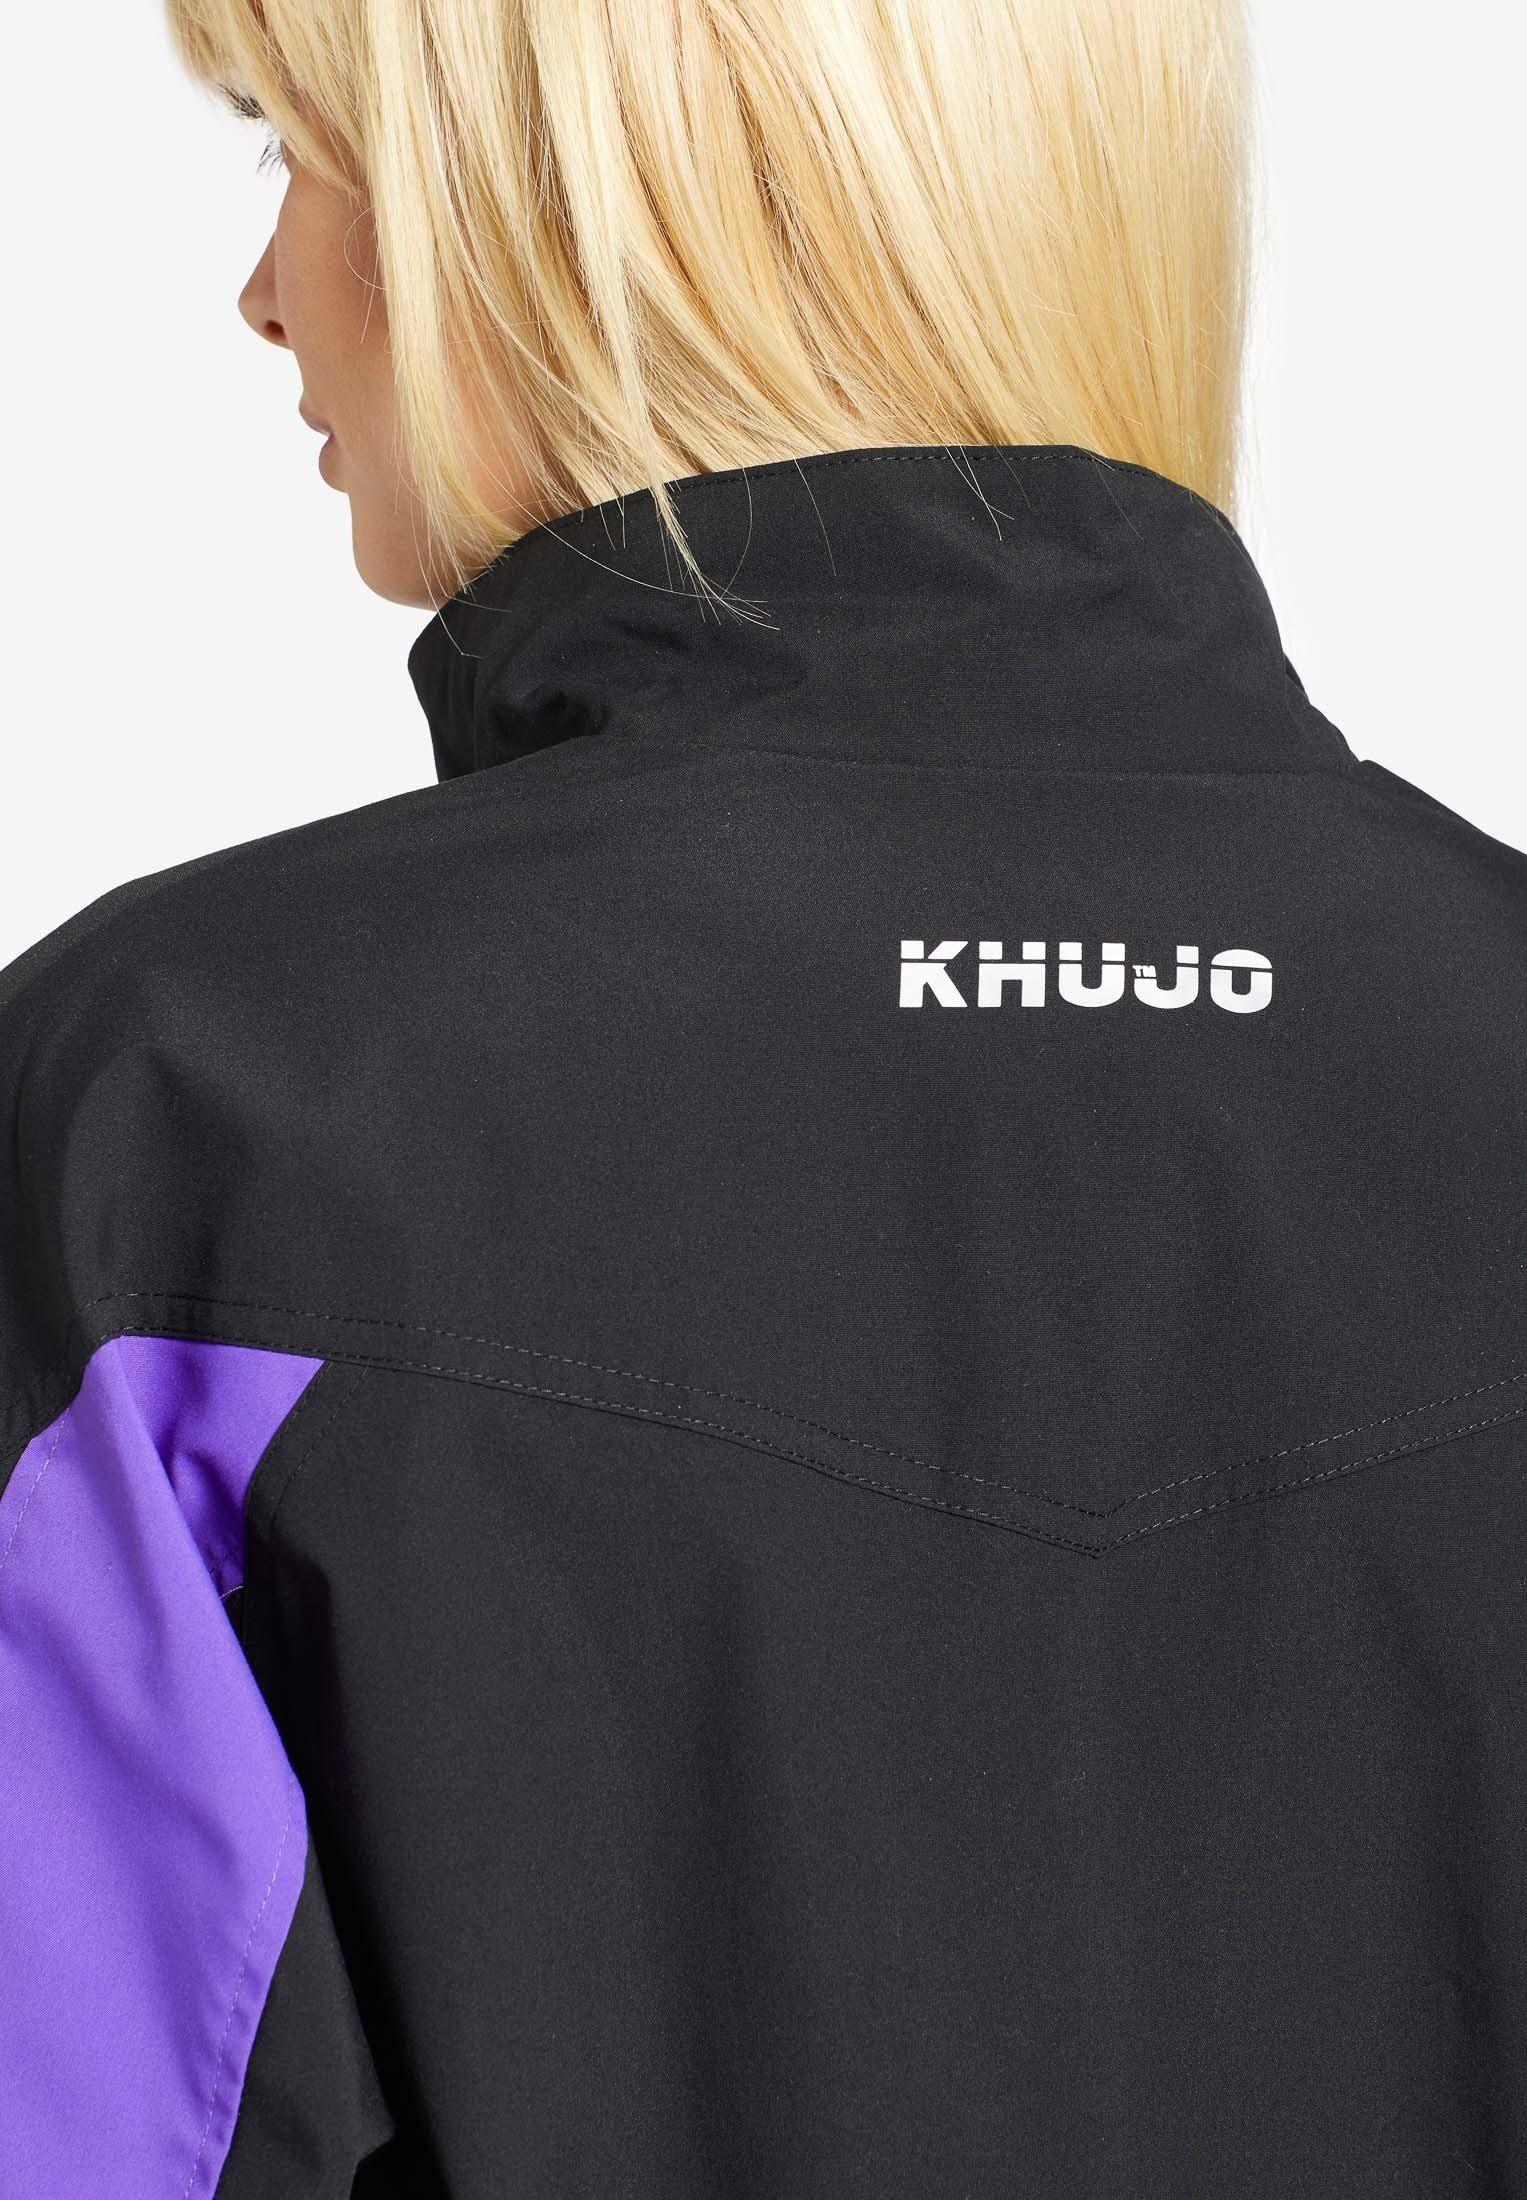 Khujo Trainingsjacke »hope« (1-st) Mit Color Blocking An Den Ärmeln Online Kaufen